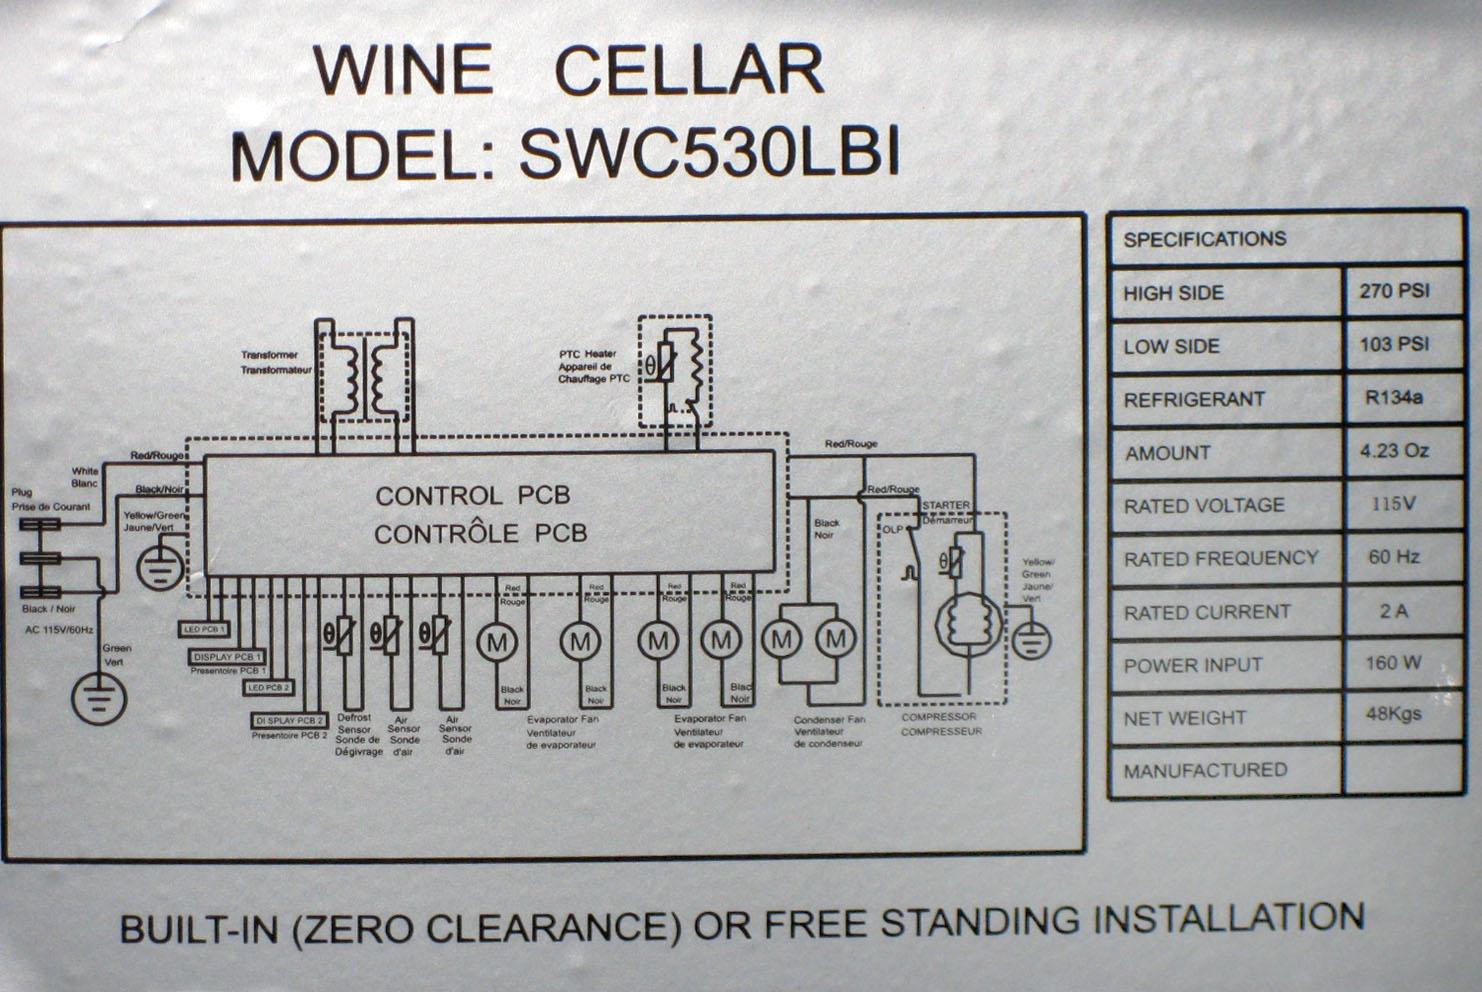 1948 Ge Refrigerator Schematic Real Wiring Diagram Sxs Summit Electrical General Electric Schematics